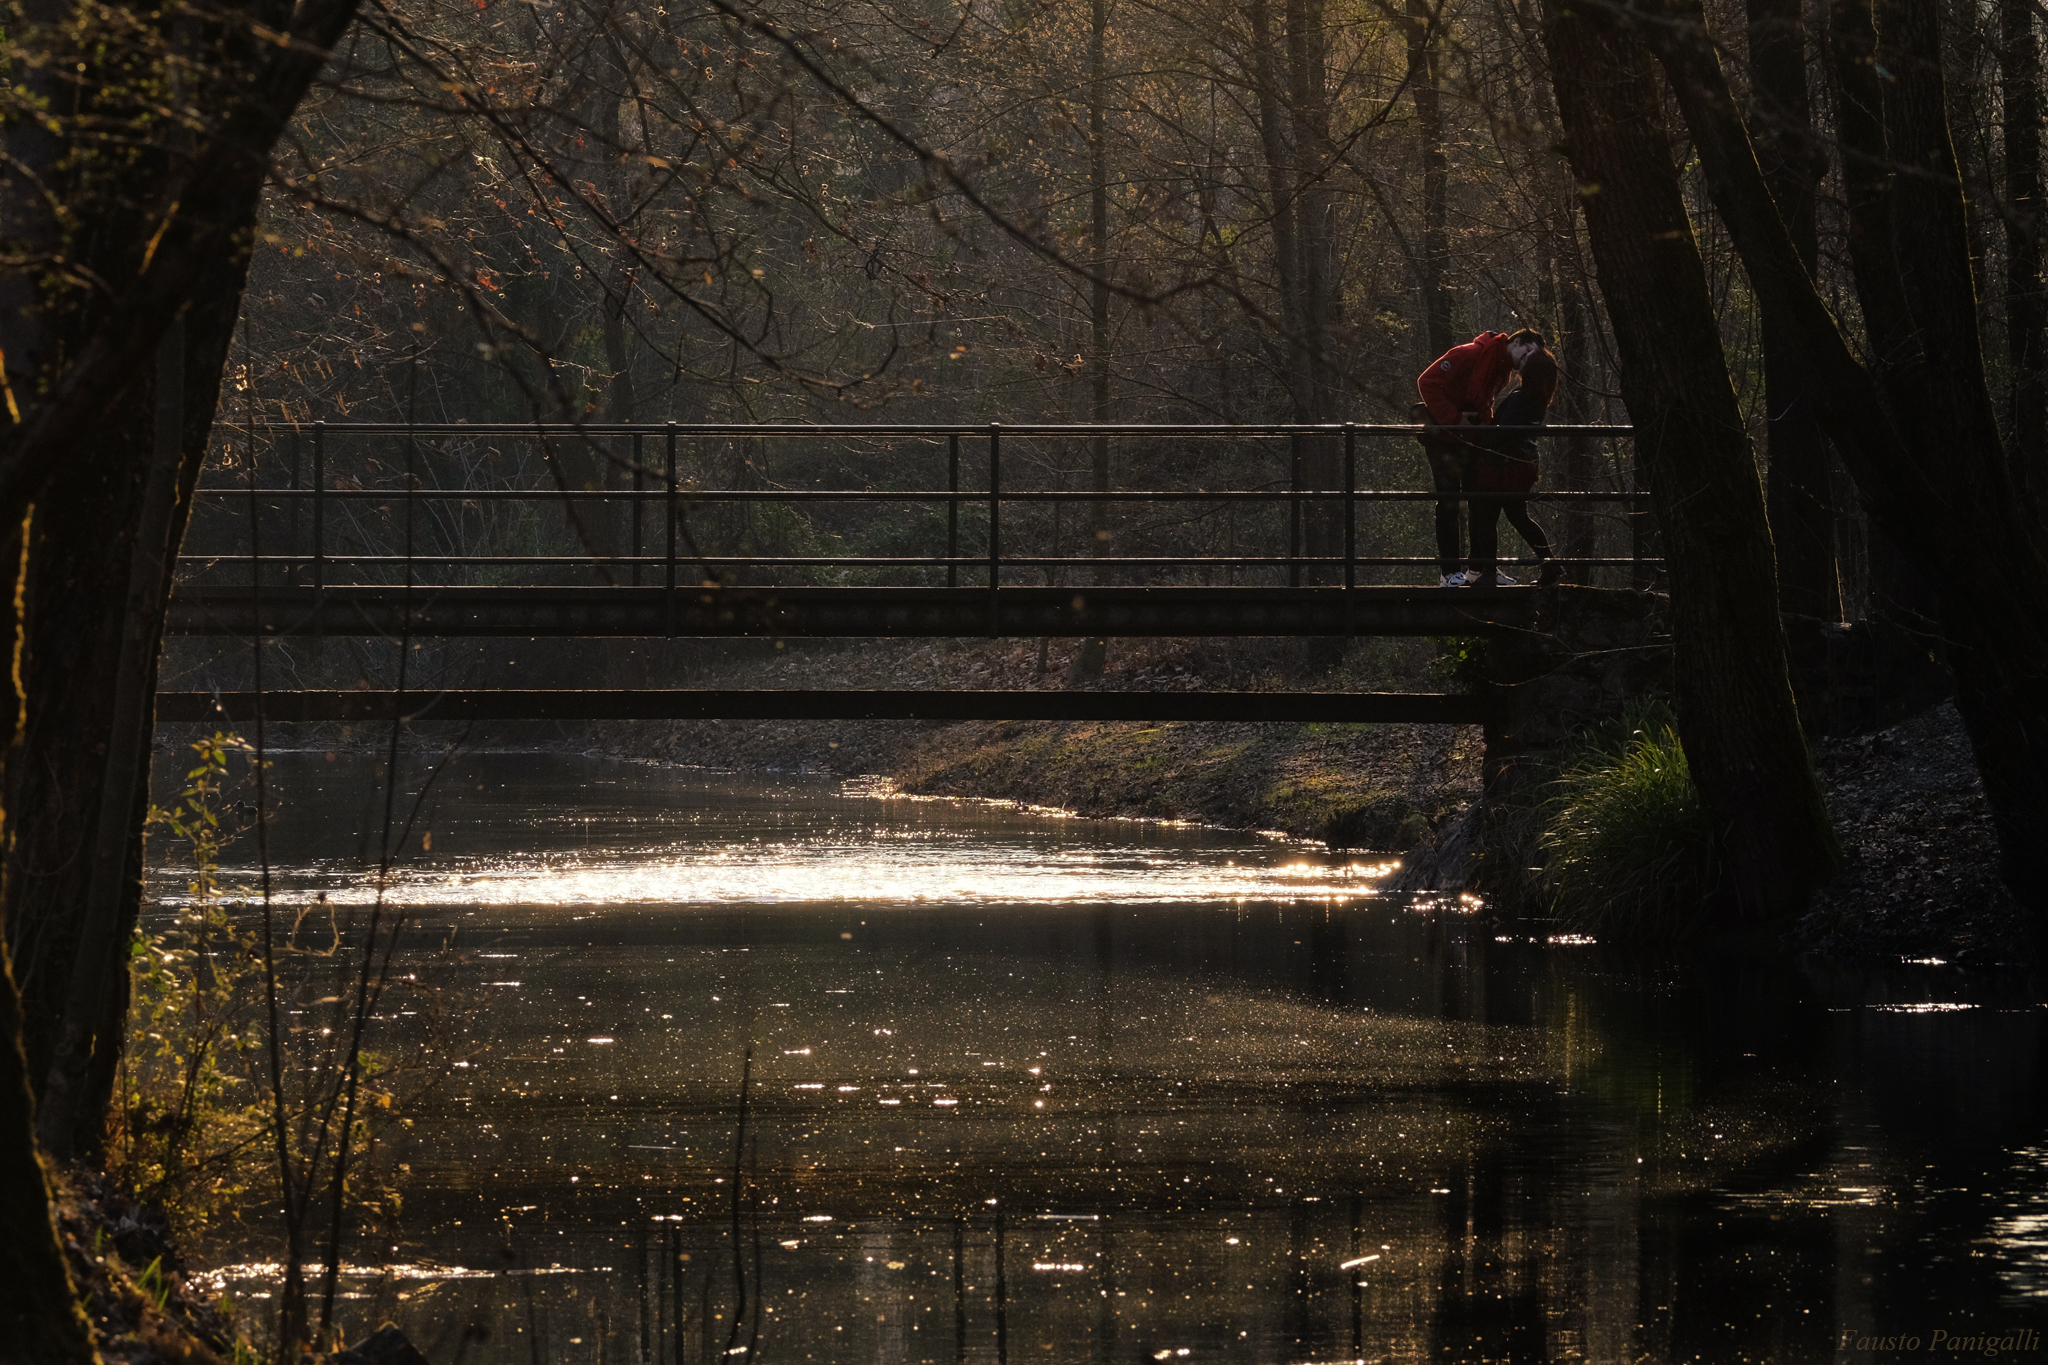 The kiss on the bridge...